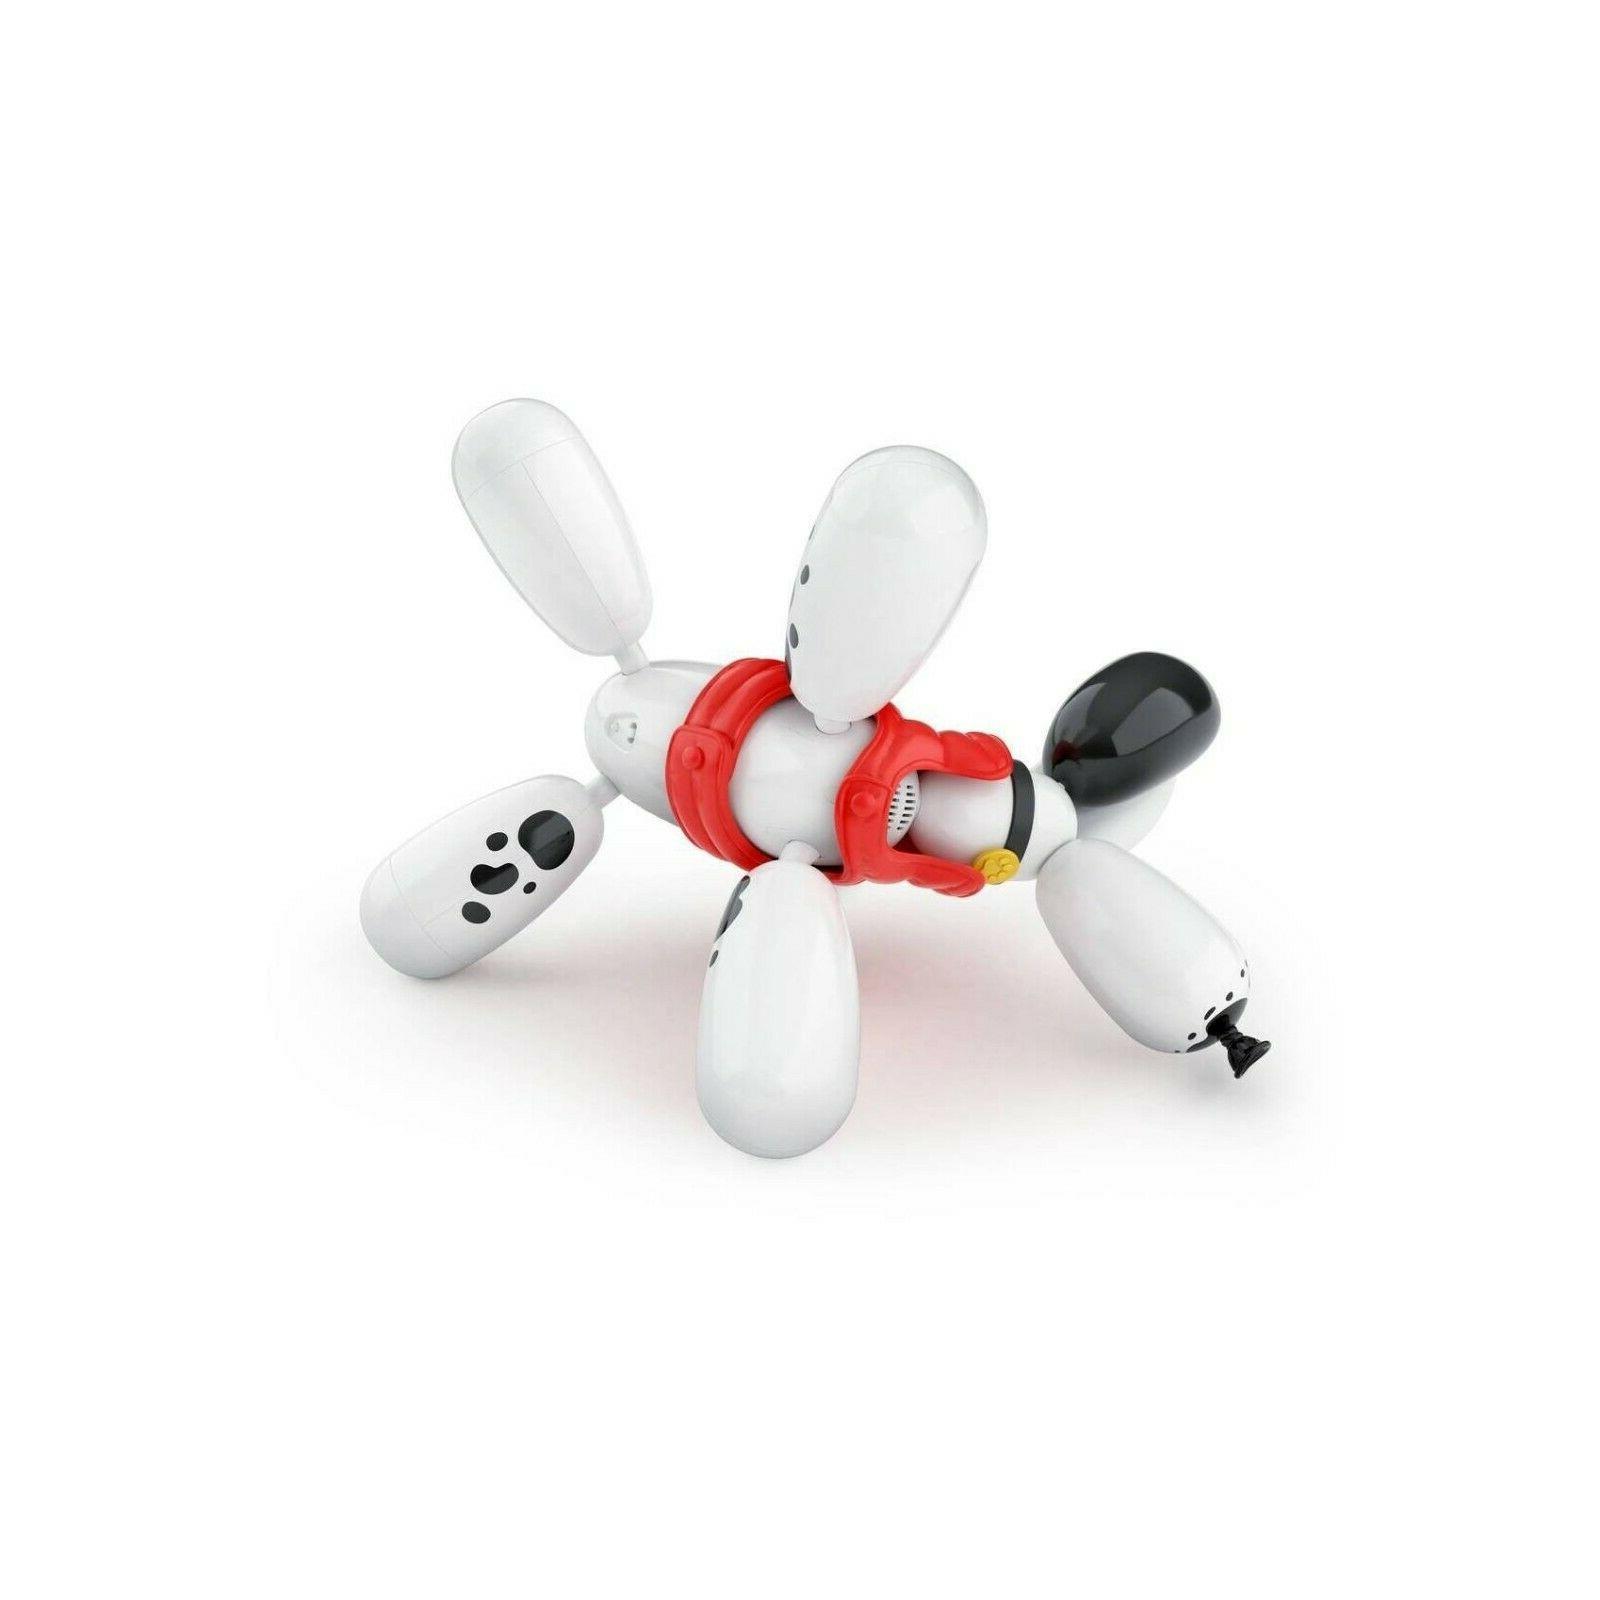 Spotty the Dalmatian Balloon for